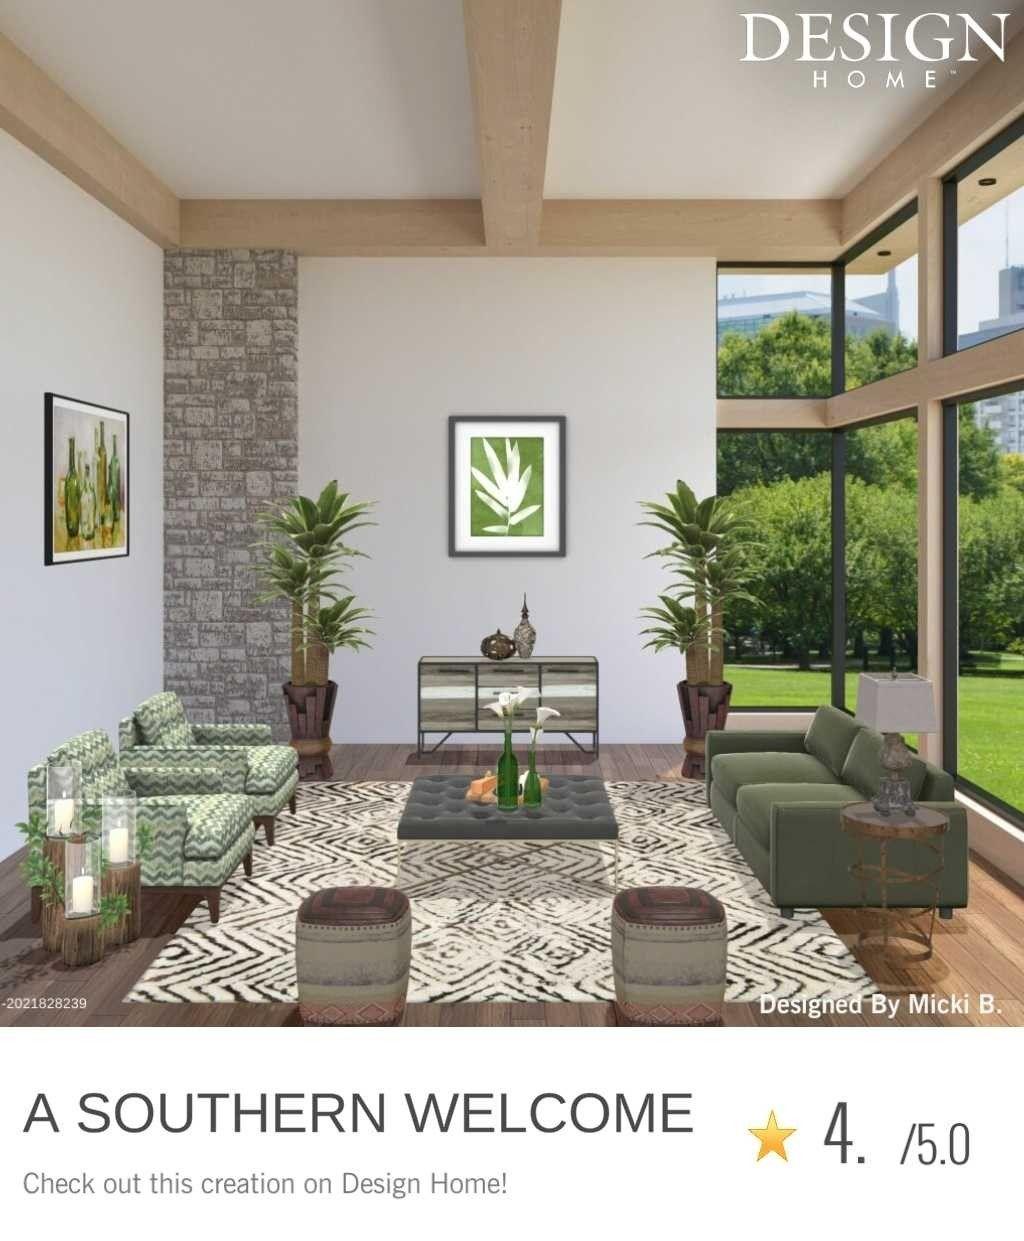 Pin By Michelle Britvec On Design Home App In 2020 Design Home